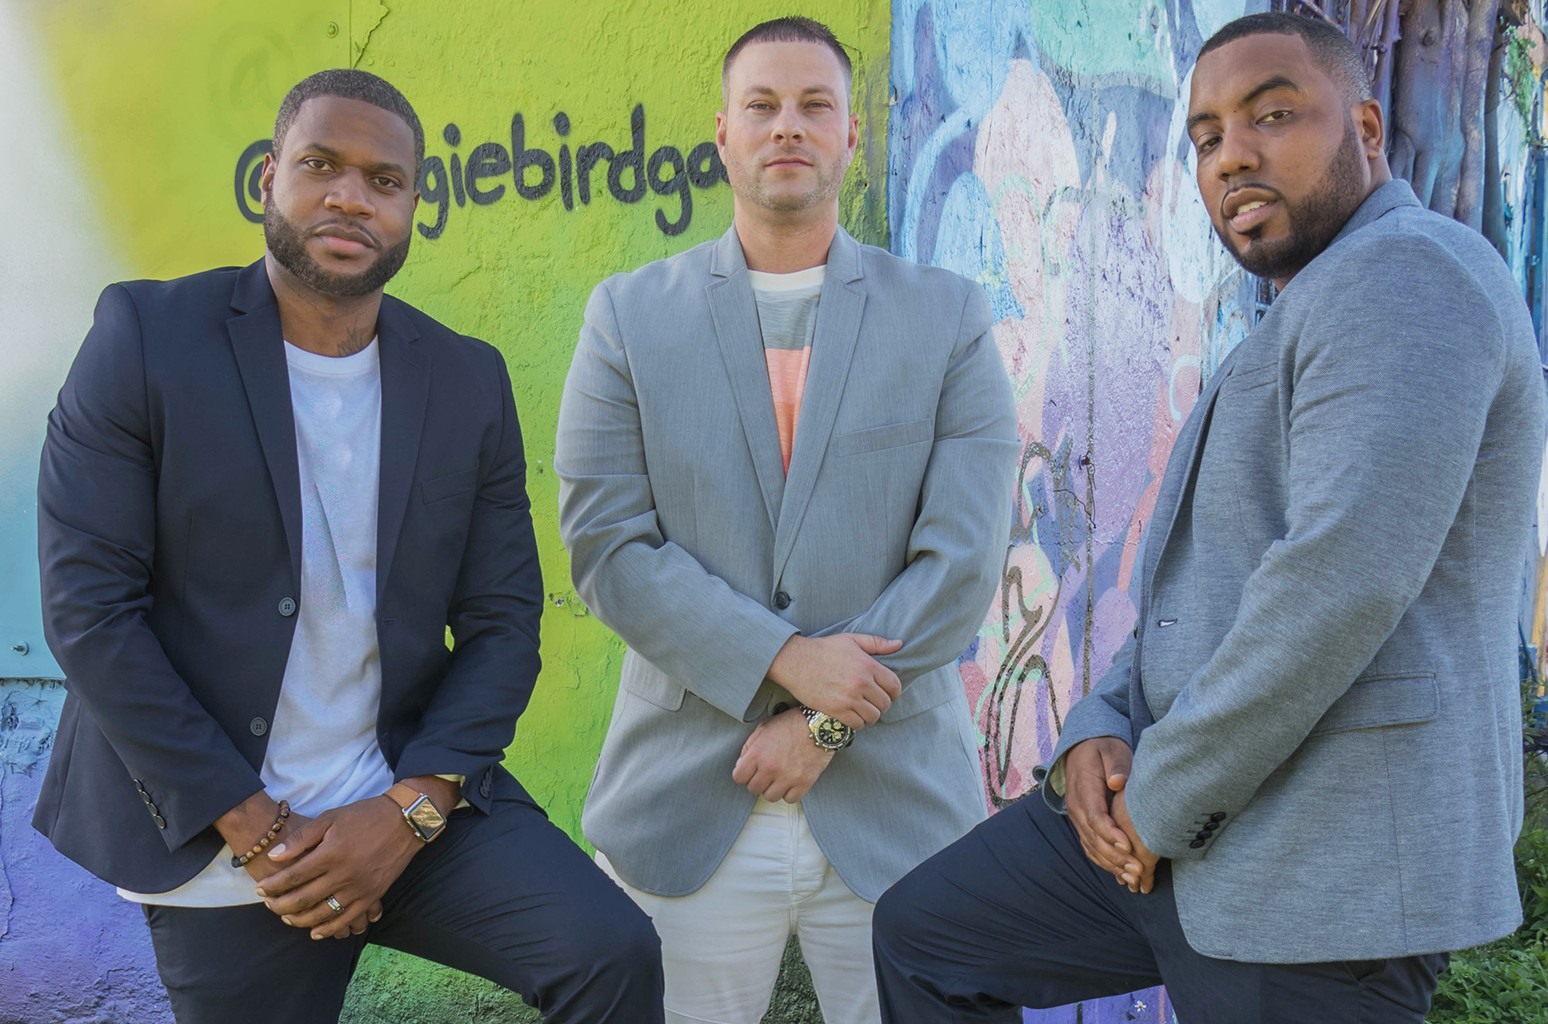 RecordGram founders Winston 'DJ Blackout' Thomas, Erik Mendelson and Shawn MIMS.